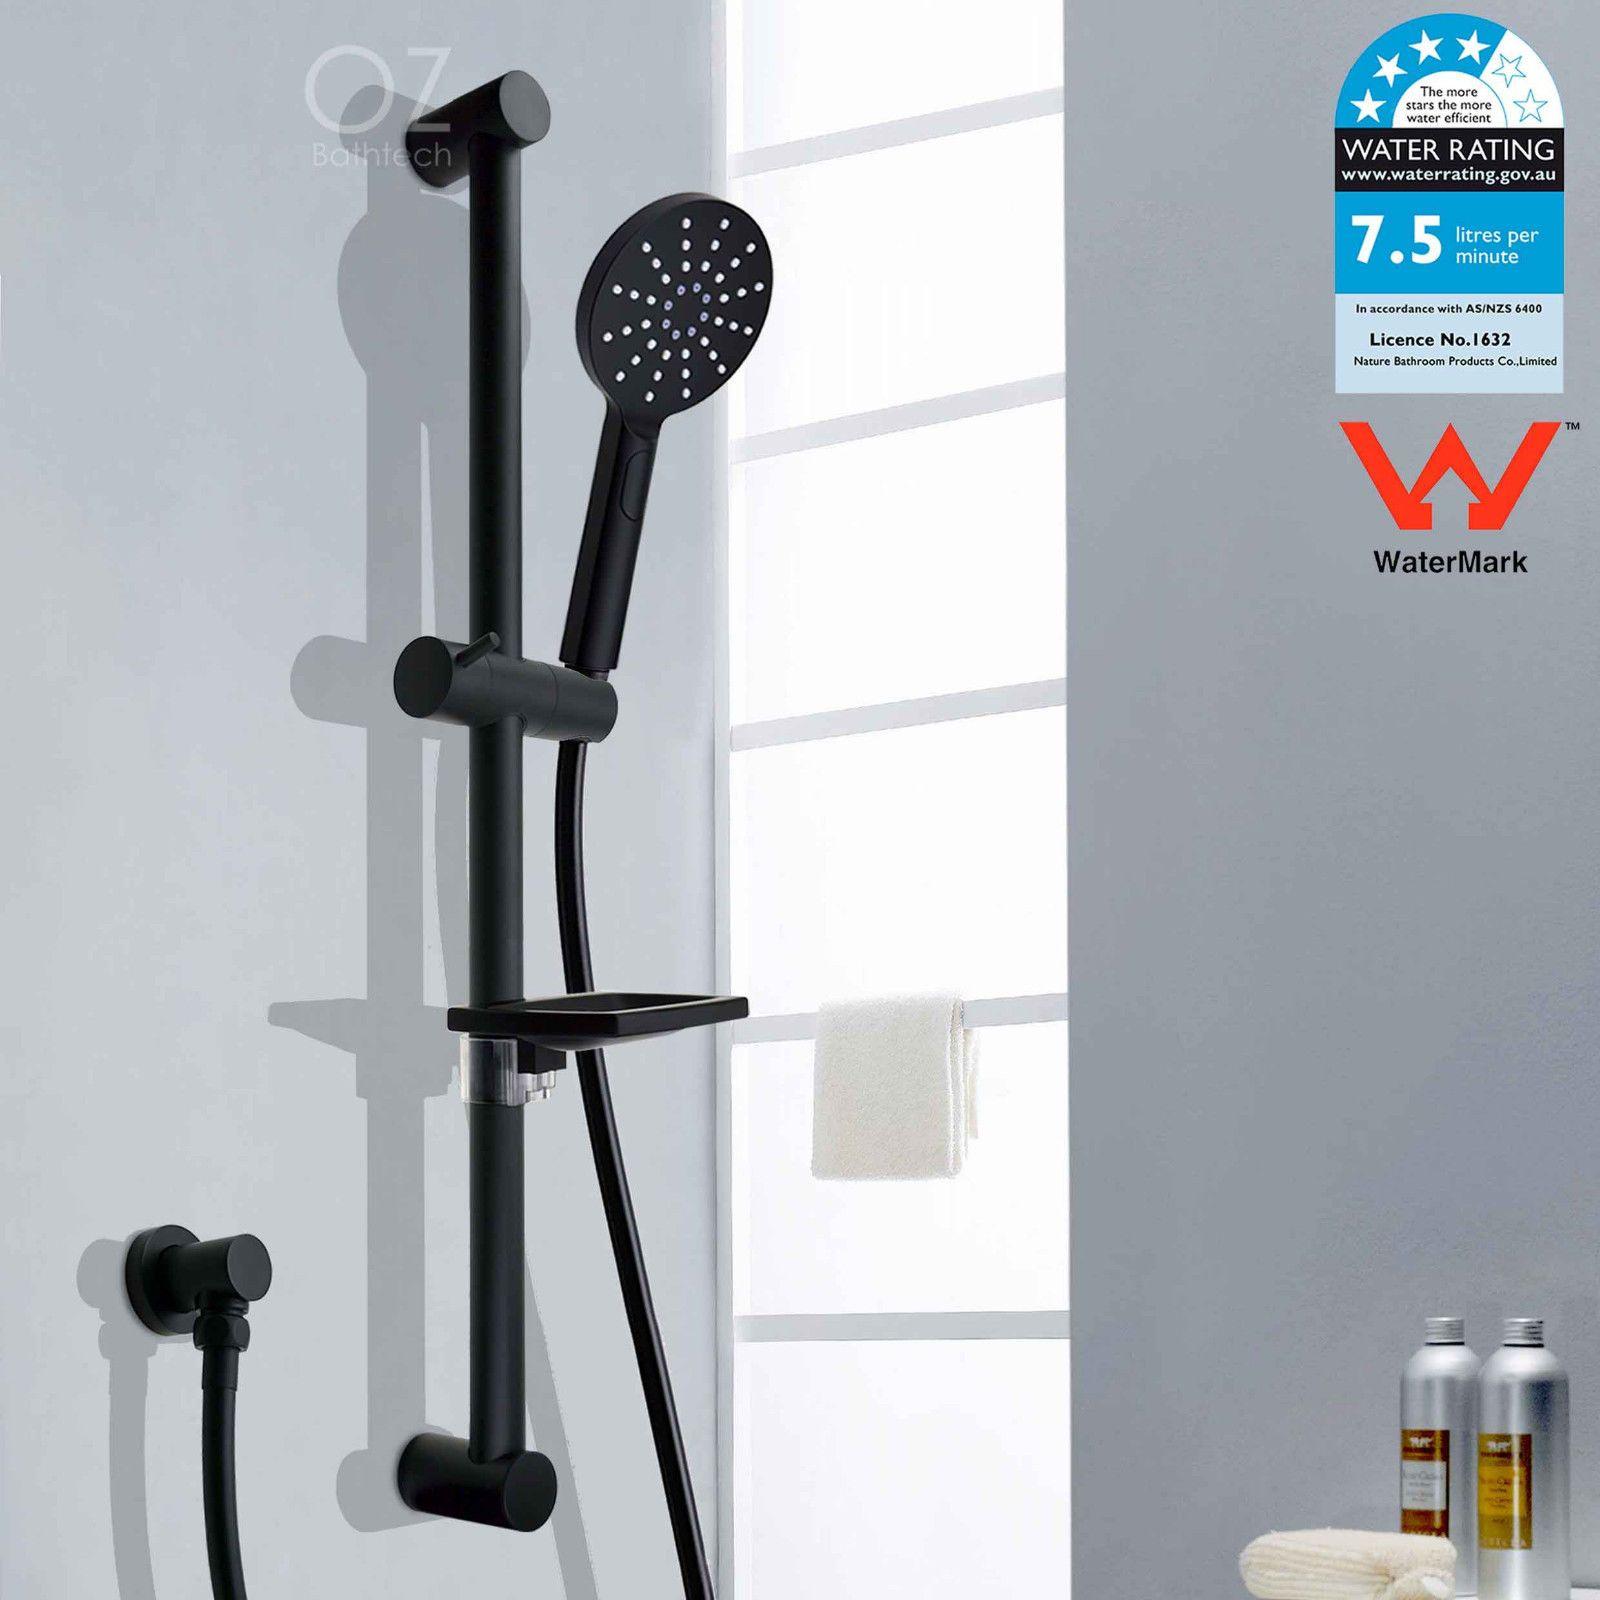 Shower Head & Sliding Rail. Shower Head & Arm Set. With